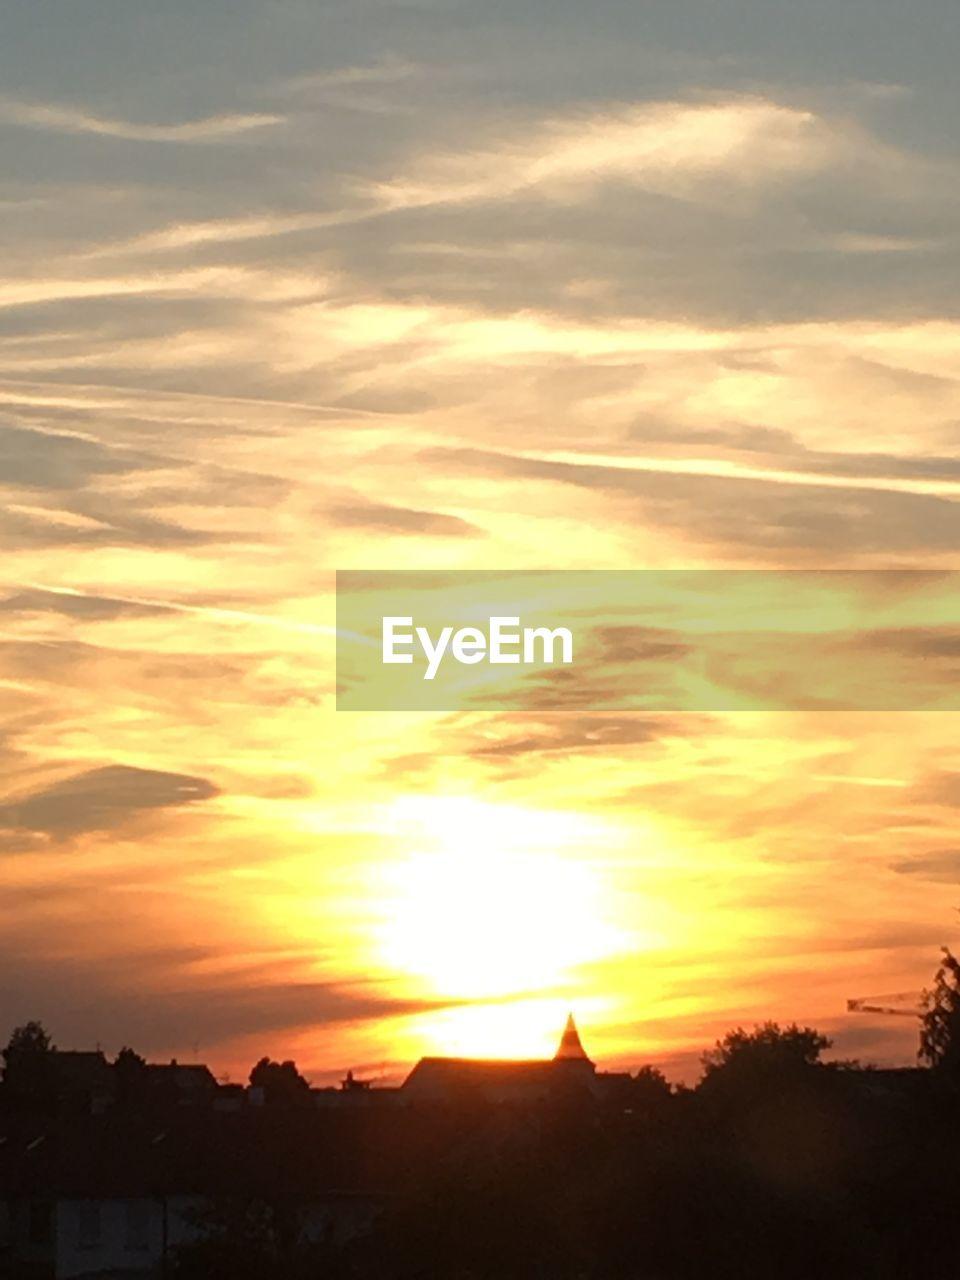 sky, sunset, cloud - sky, silhouette, beauty in nature, scenics - nature, tranquility, orange color, tranquil scene, tree, no people, nature, plant, sun, idyllic, landscape, environment, outdoors, non-urban scene, sunlight, romantic sky